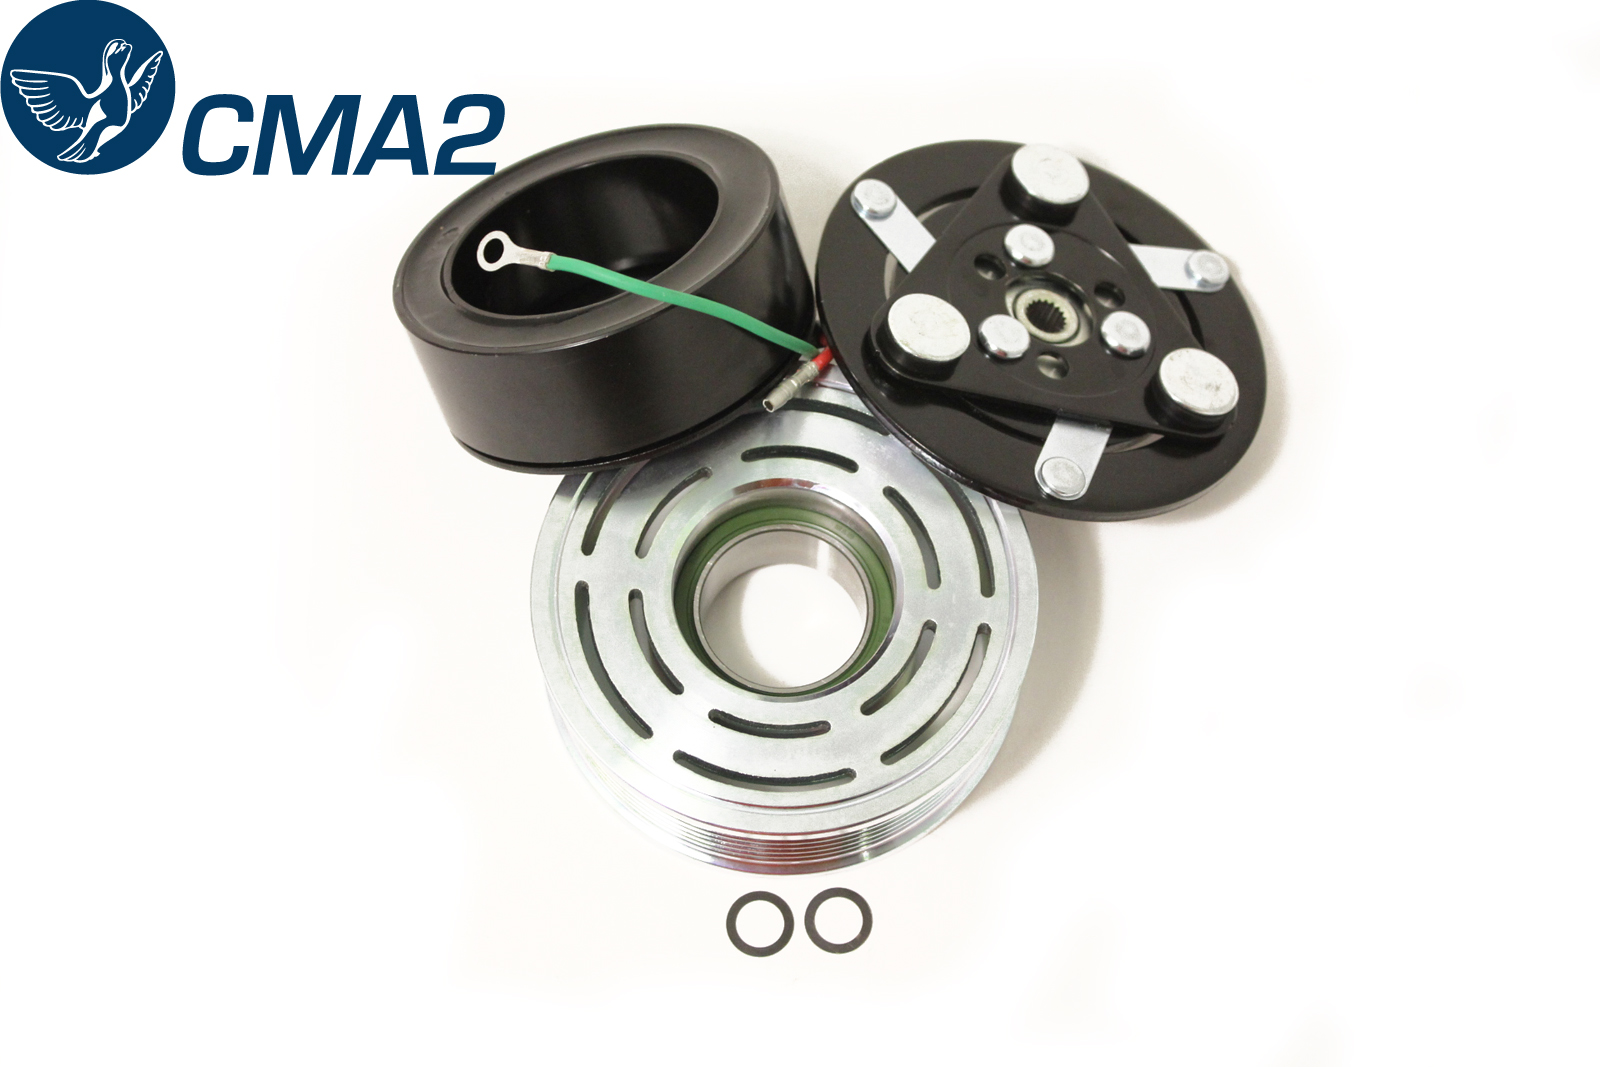 Муфта компрессора кондиционера Хонда Цивик VIII 1.8 38900-RNA-A01, 38924-RNA-A01, 38900-RNC-Z51.